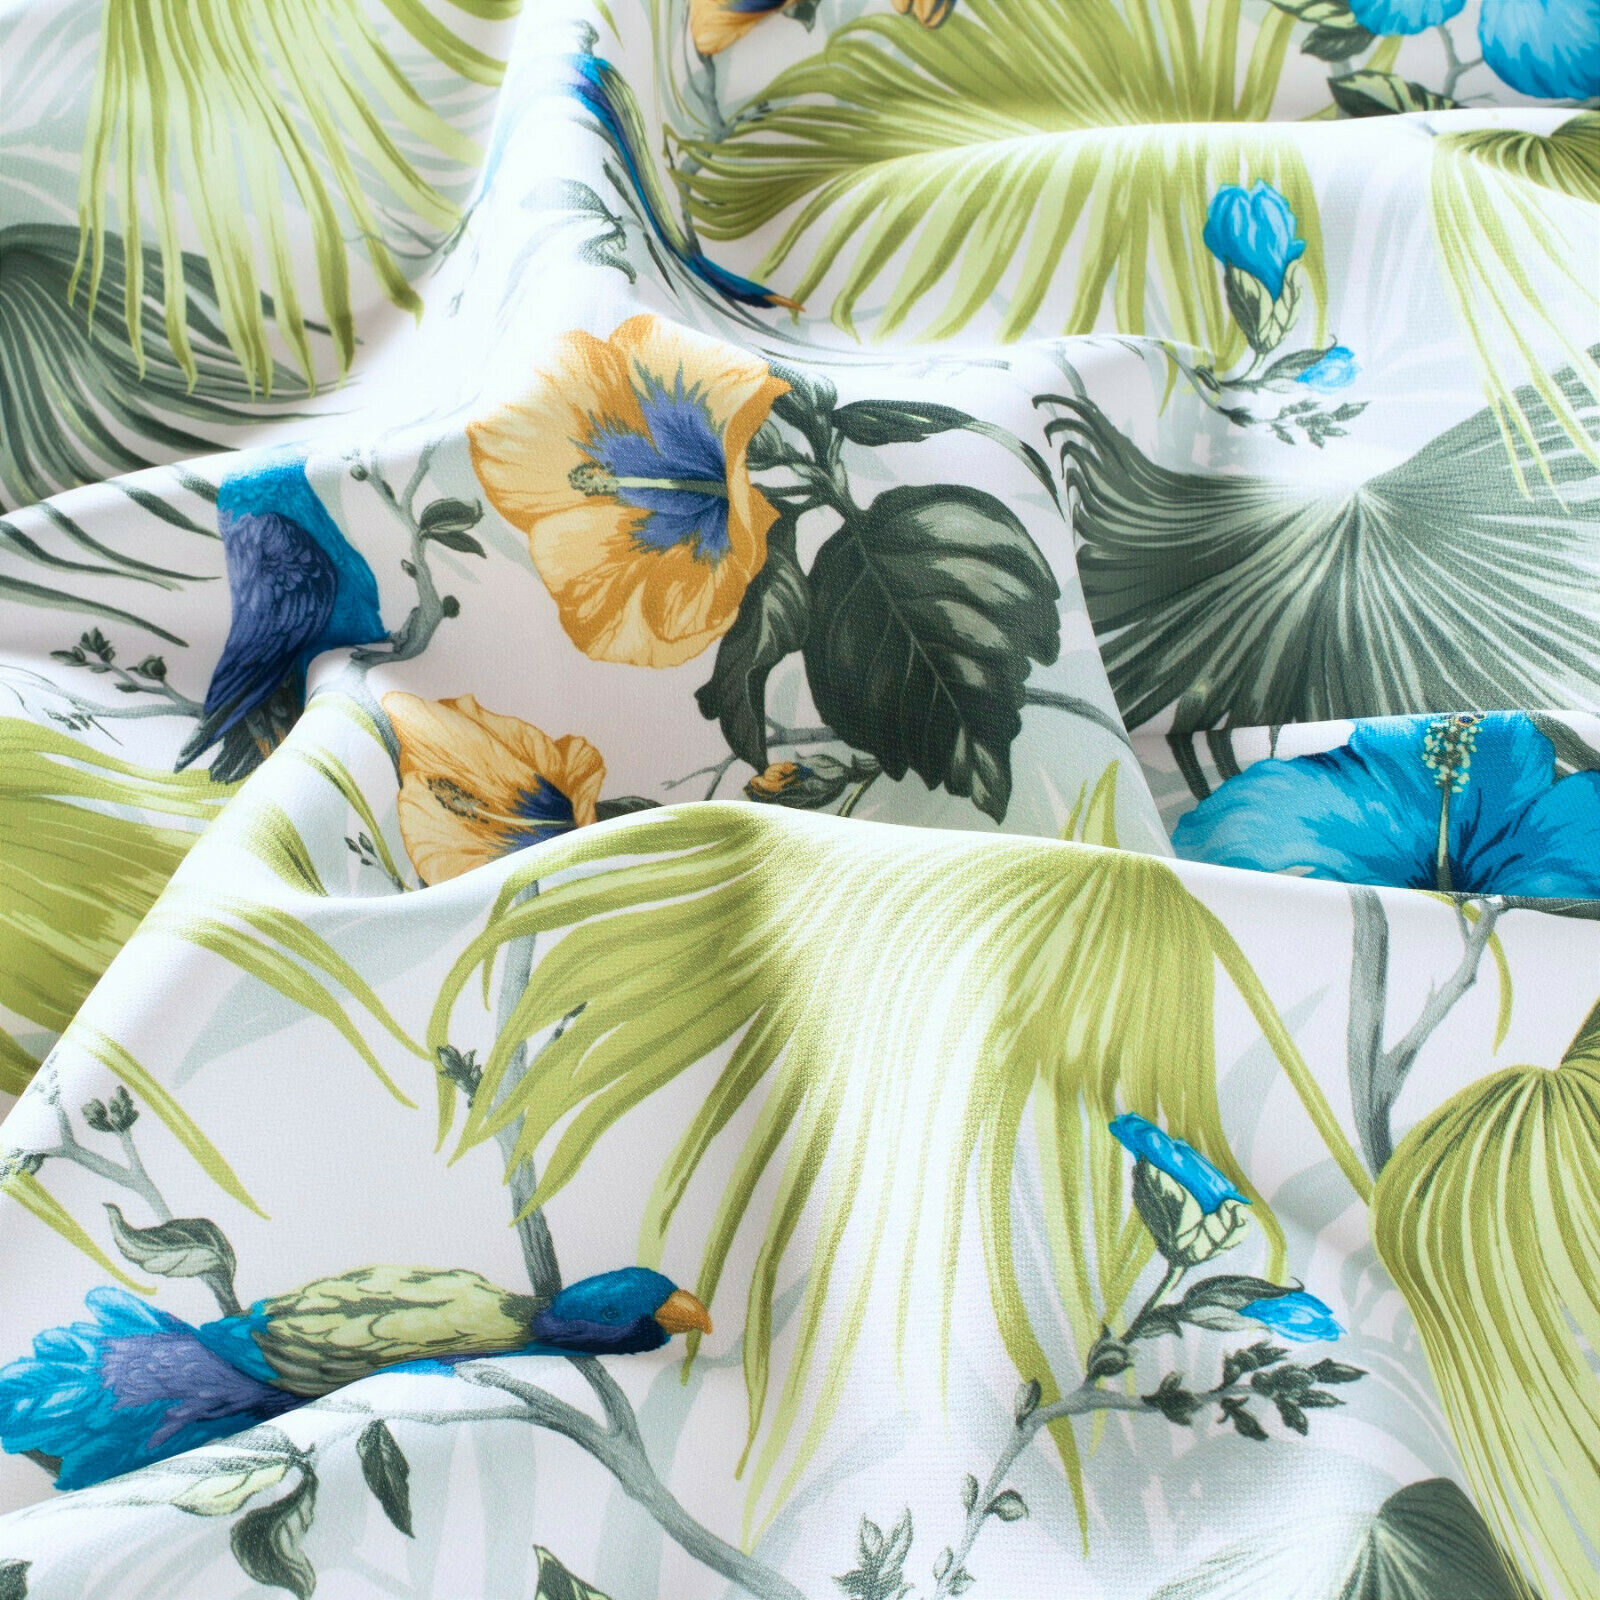 stoffdesign MEDITERRANEOOutdoor Stoff Meterware fabric en plein air JAB